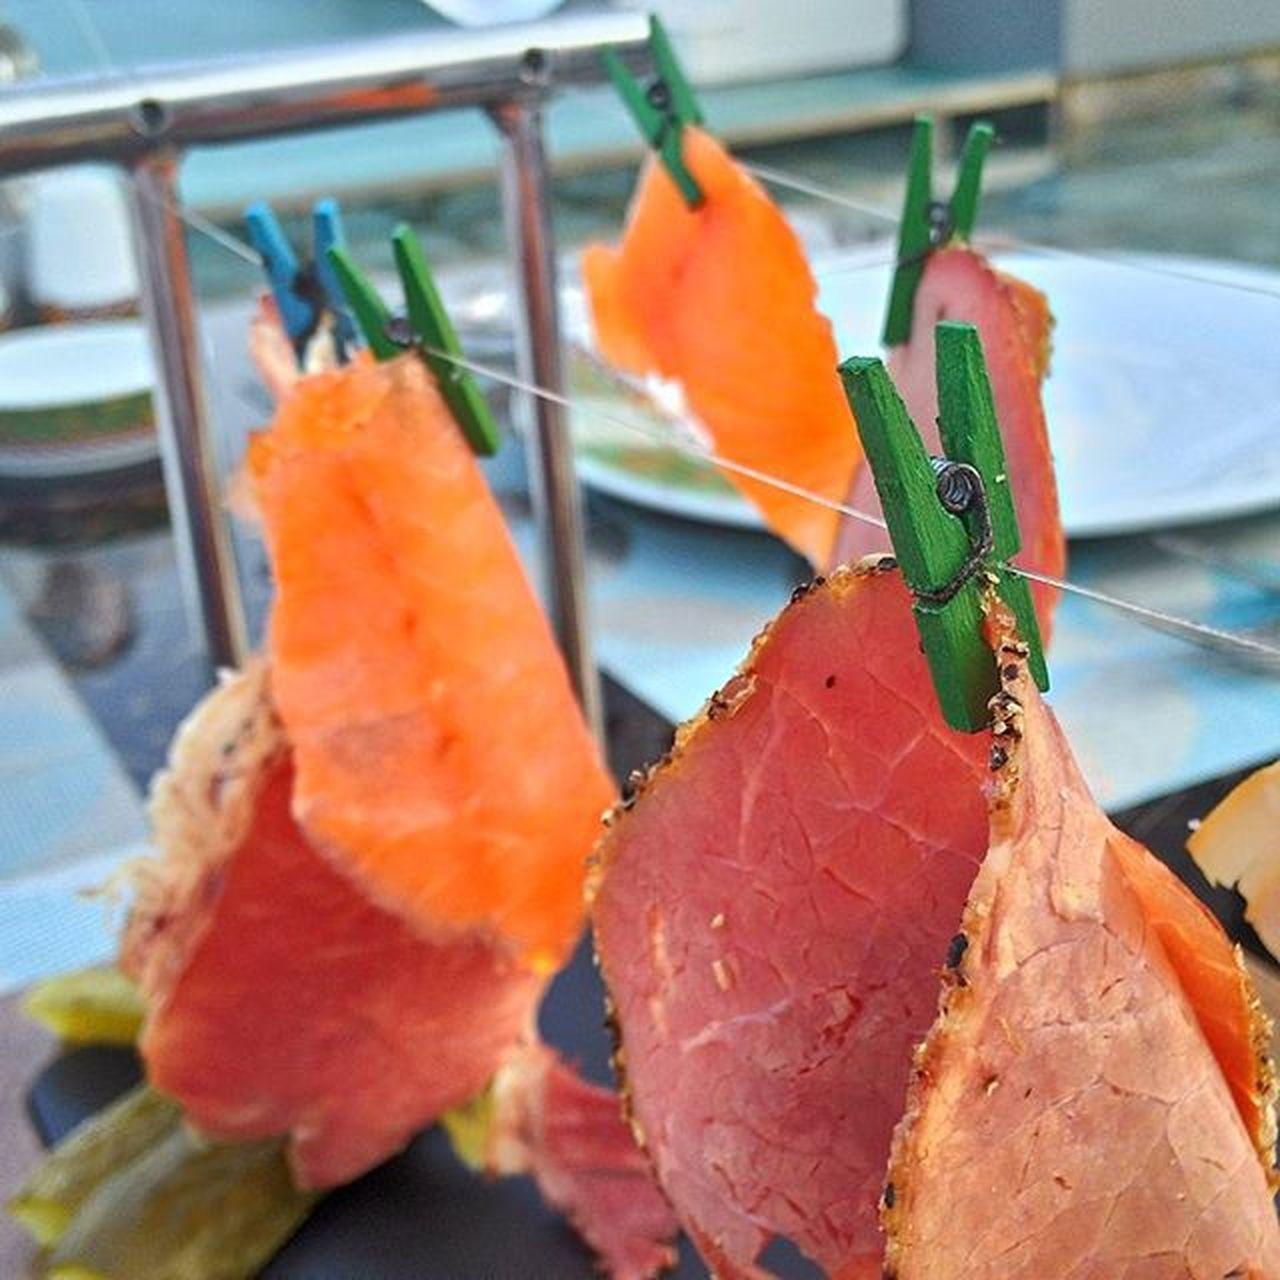 наотдыхе турция острое мяско мексиканскиеблюда мексеканскийресторан минипрещепки вкуснотень Asuspadfones Rixospremiumtekirova Rixos Rixostekirova Turkey Kemer Antalya 2015